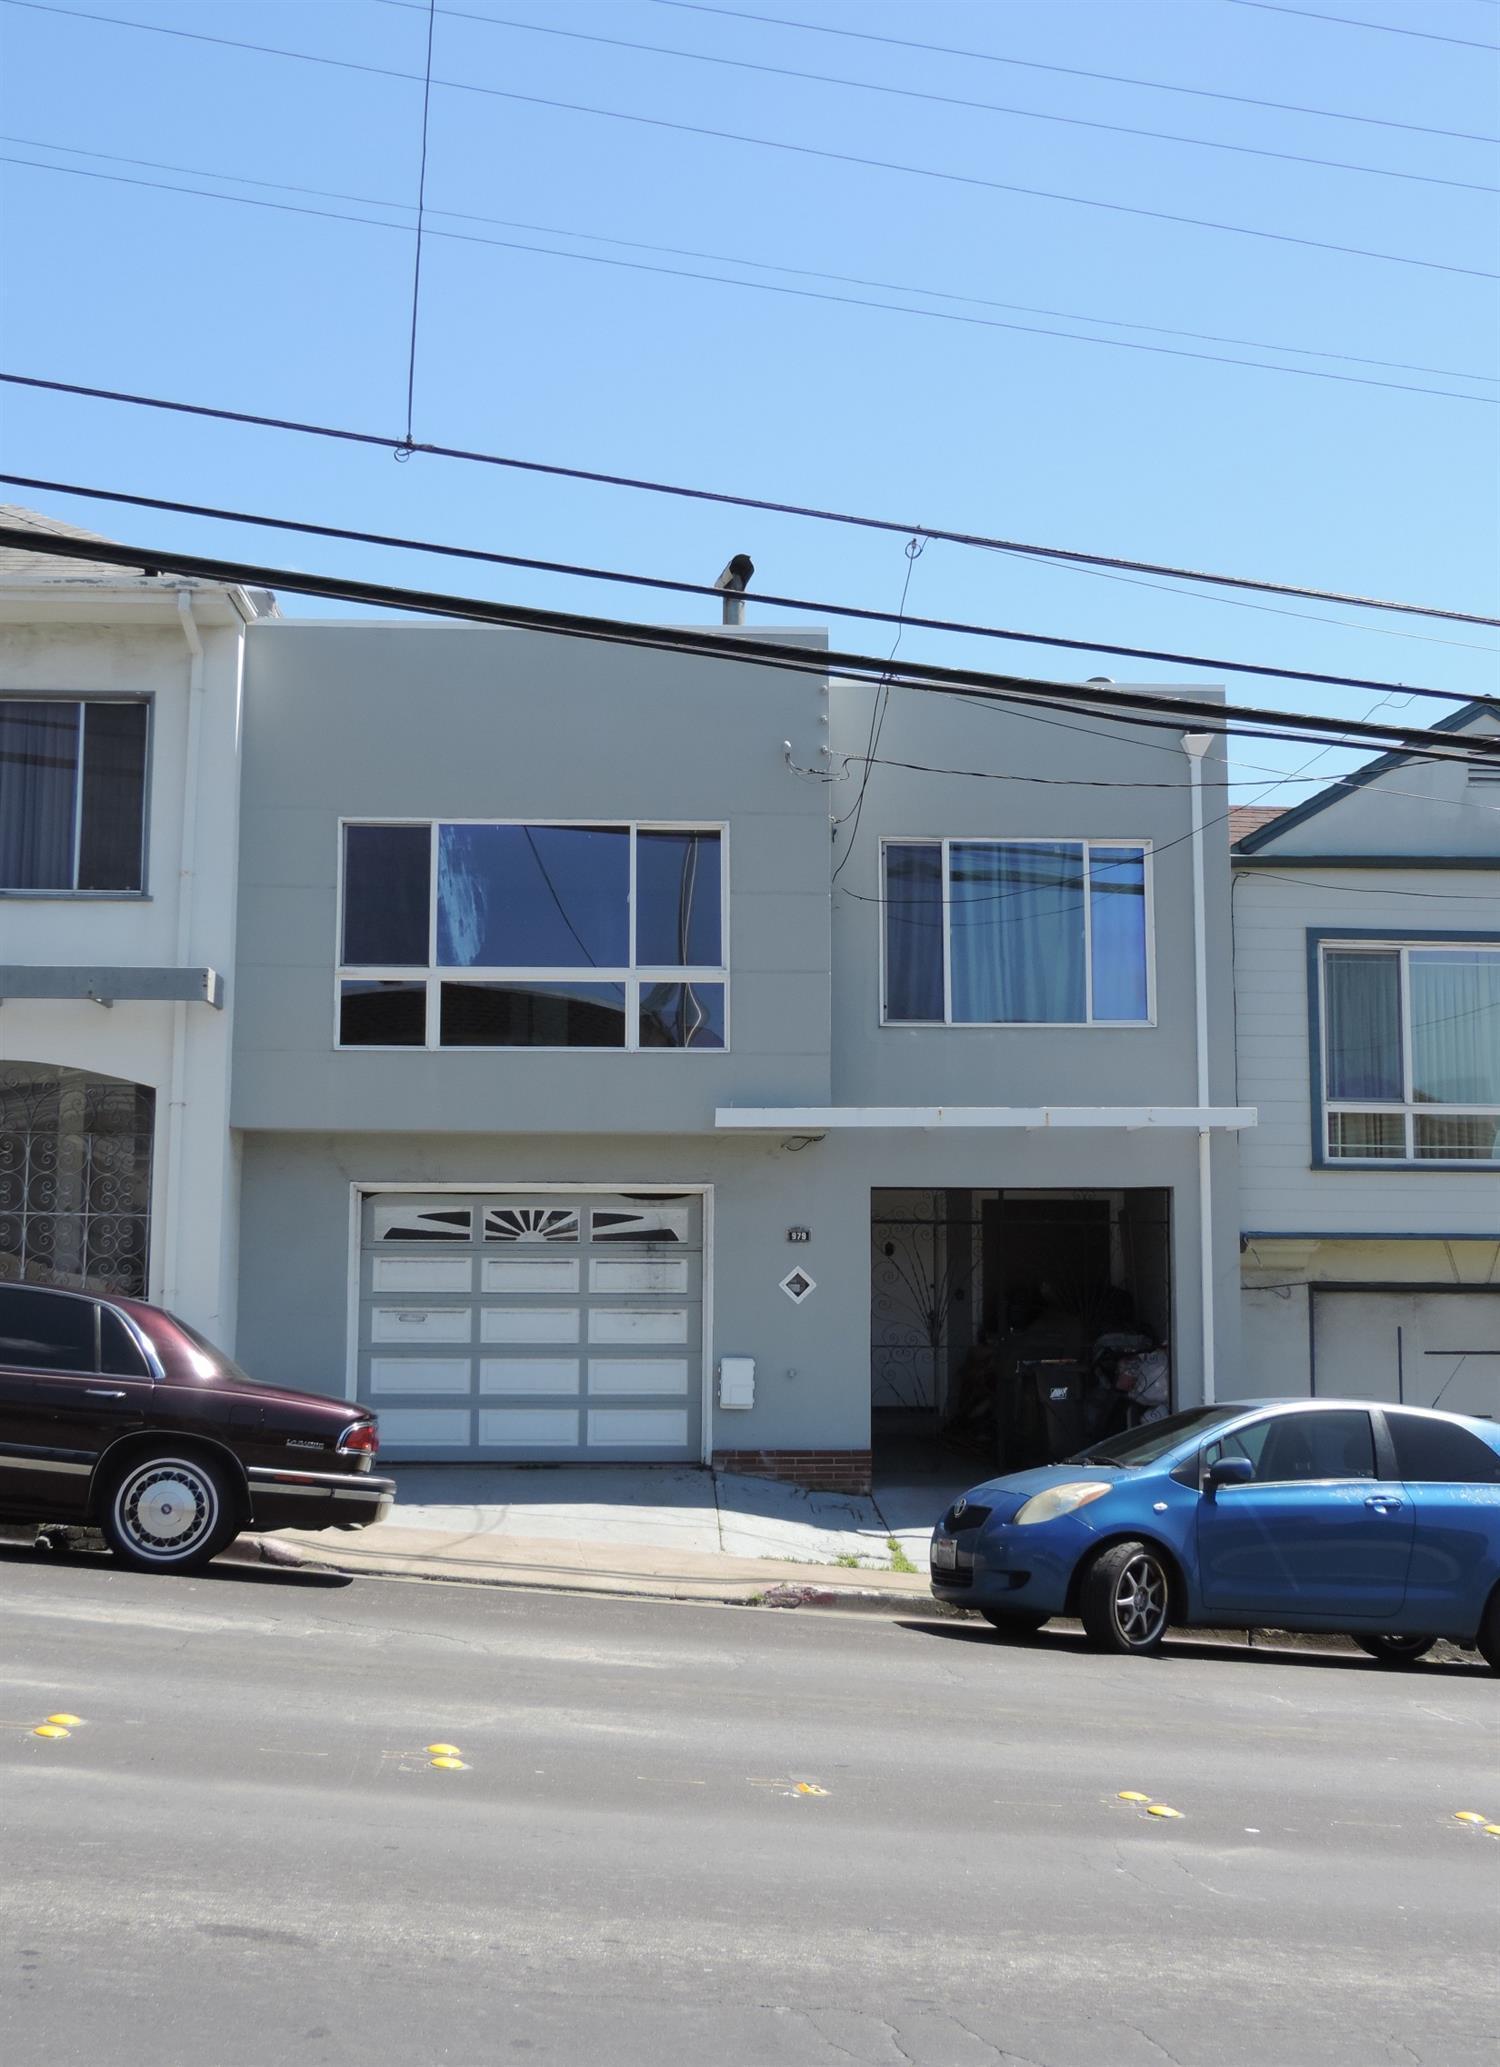 979 Hillside Blvd, Daly City, CA — MLS# 18021337 — Coldwell Banker